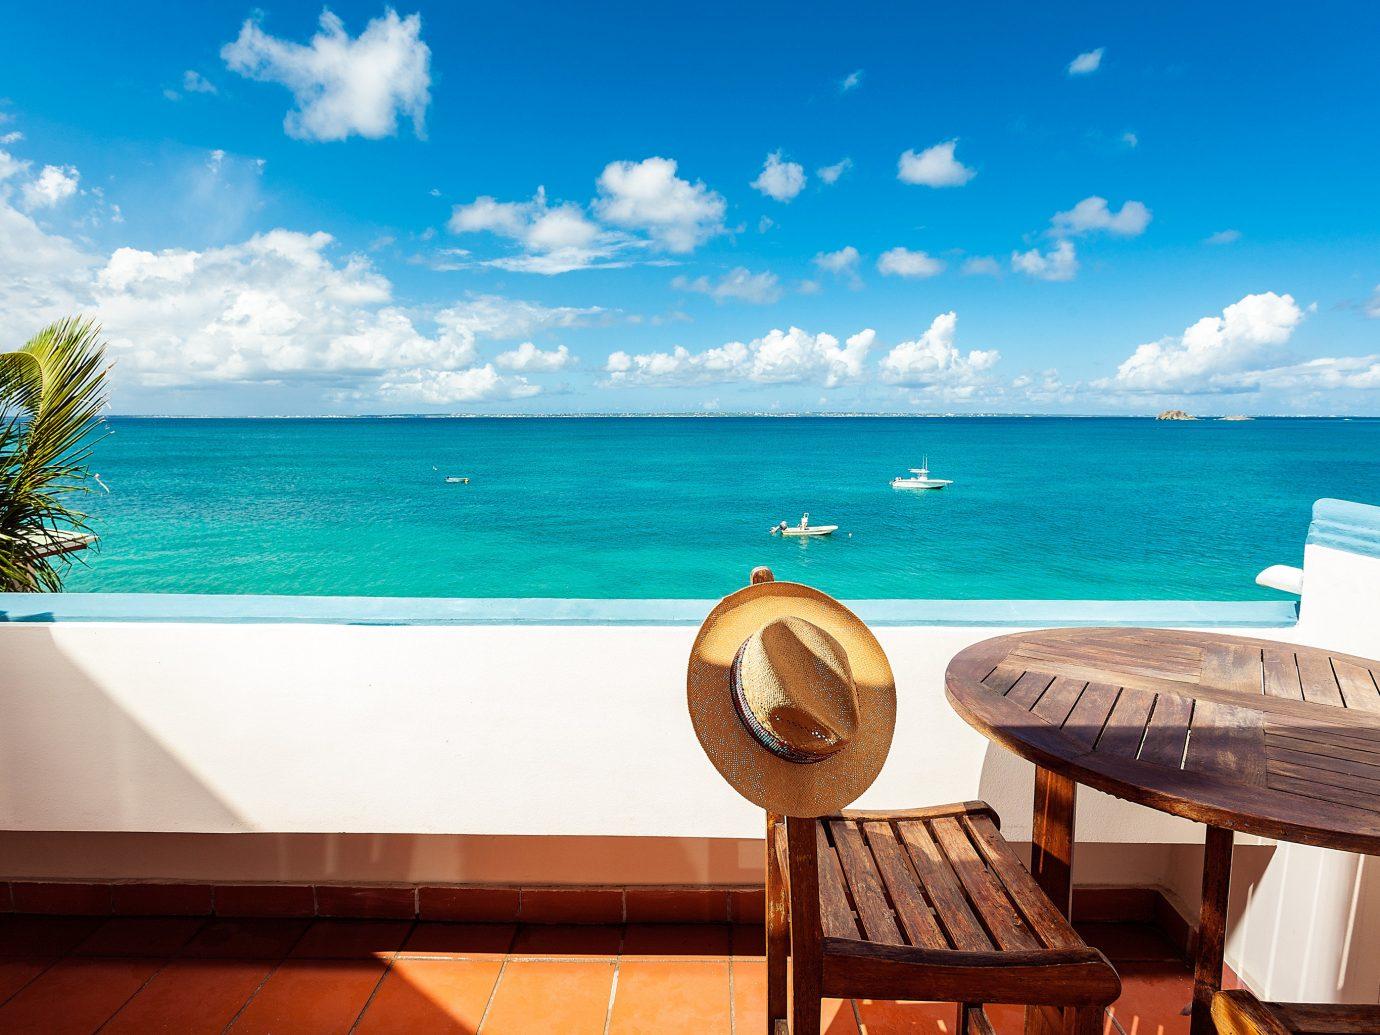 Hotels sky water Sea body of water Ocean vacation caribbean shore Resort coastal and oceanic landforms cloud Beach tropics horizon leisure swimming pool Island